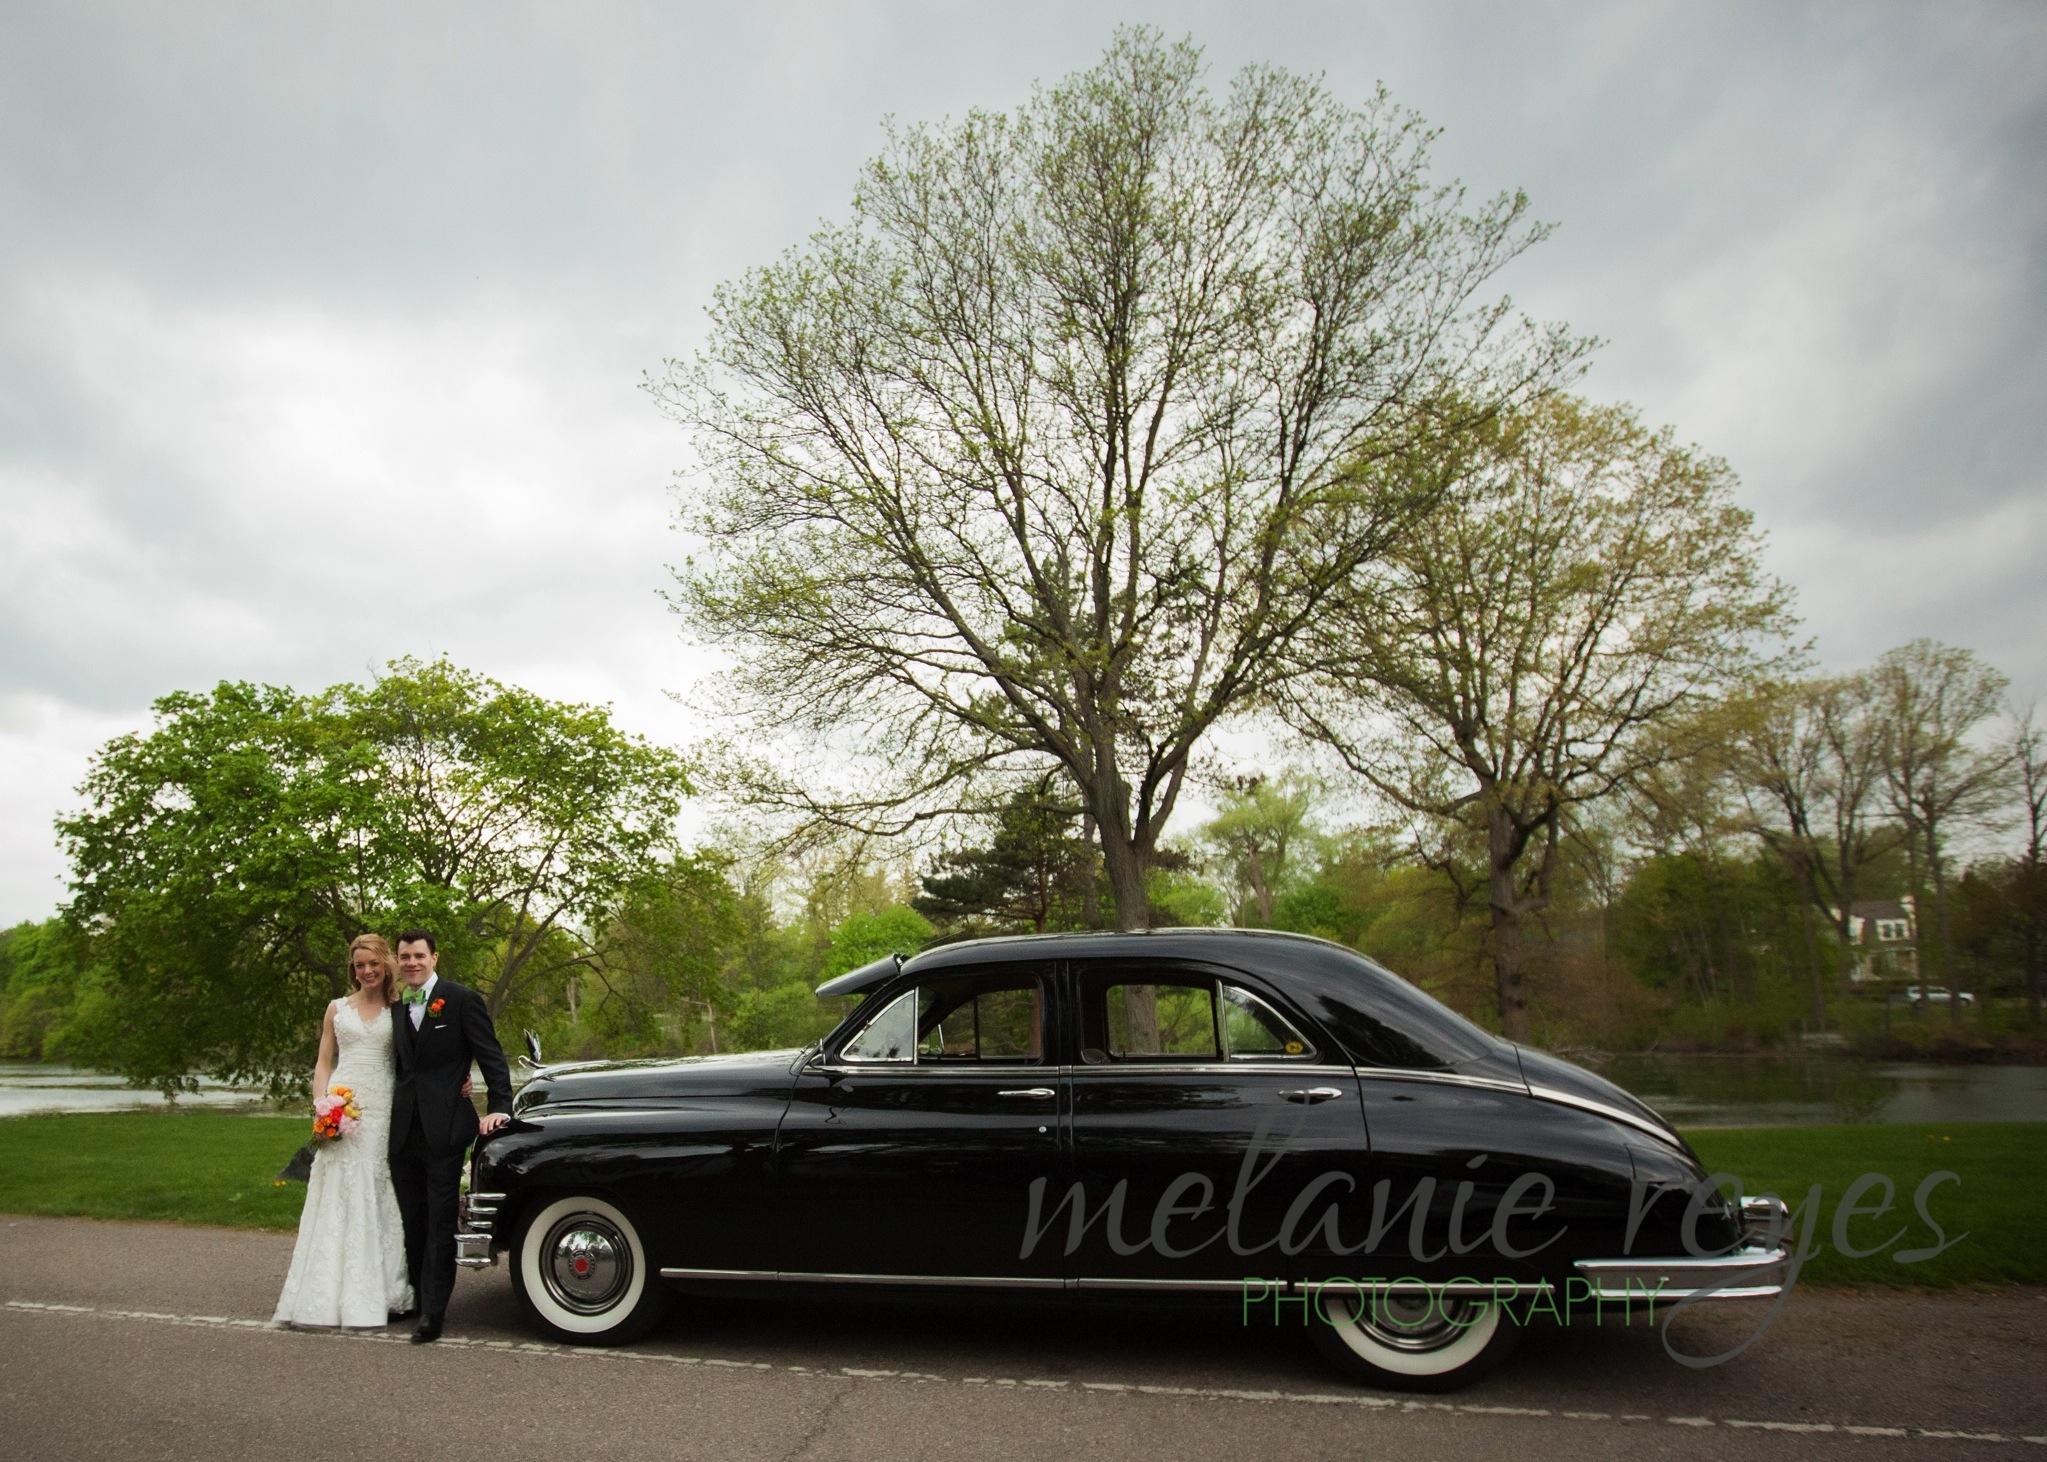 Melanie_reyes_detroit_wedding_photographer